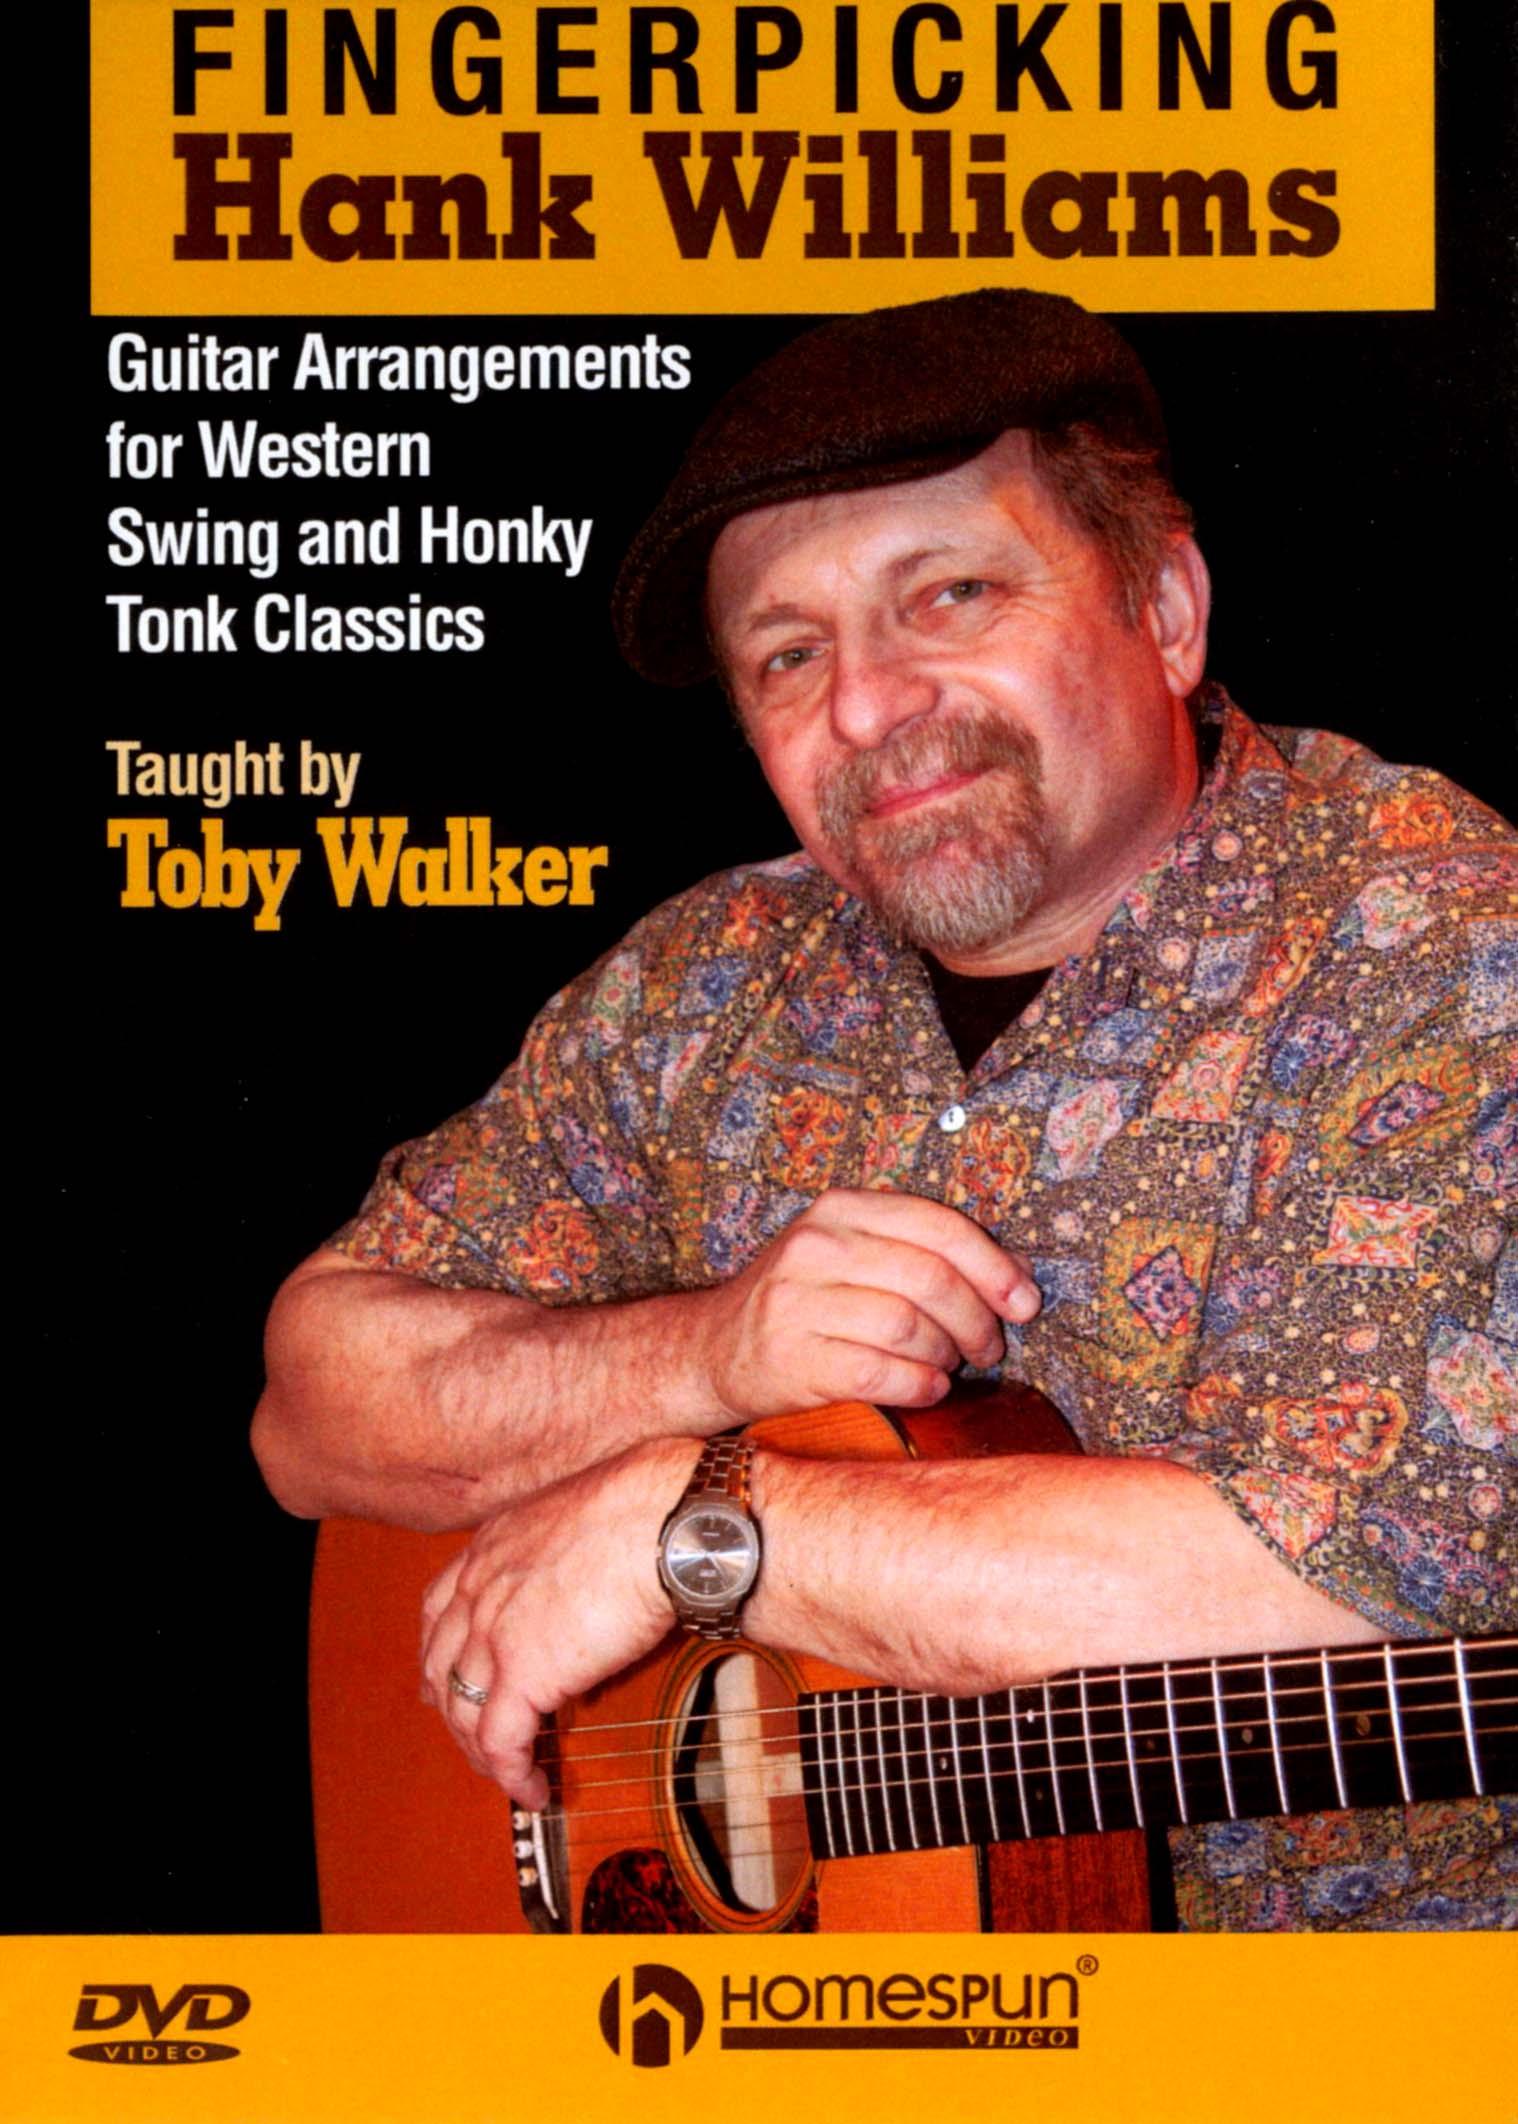 Toby Walker: Fingerpicking Hank Williams